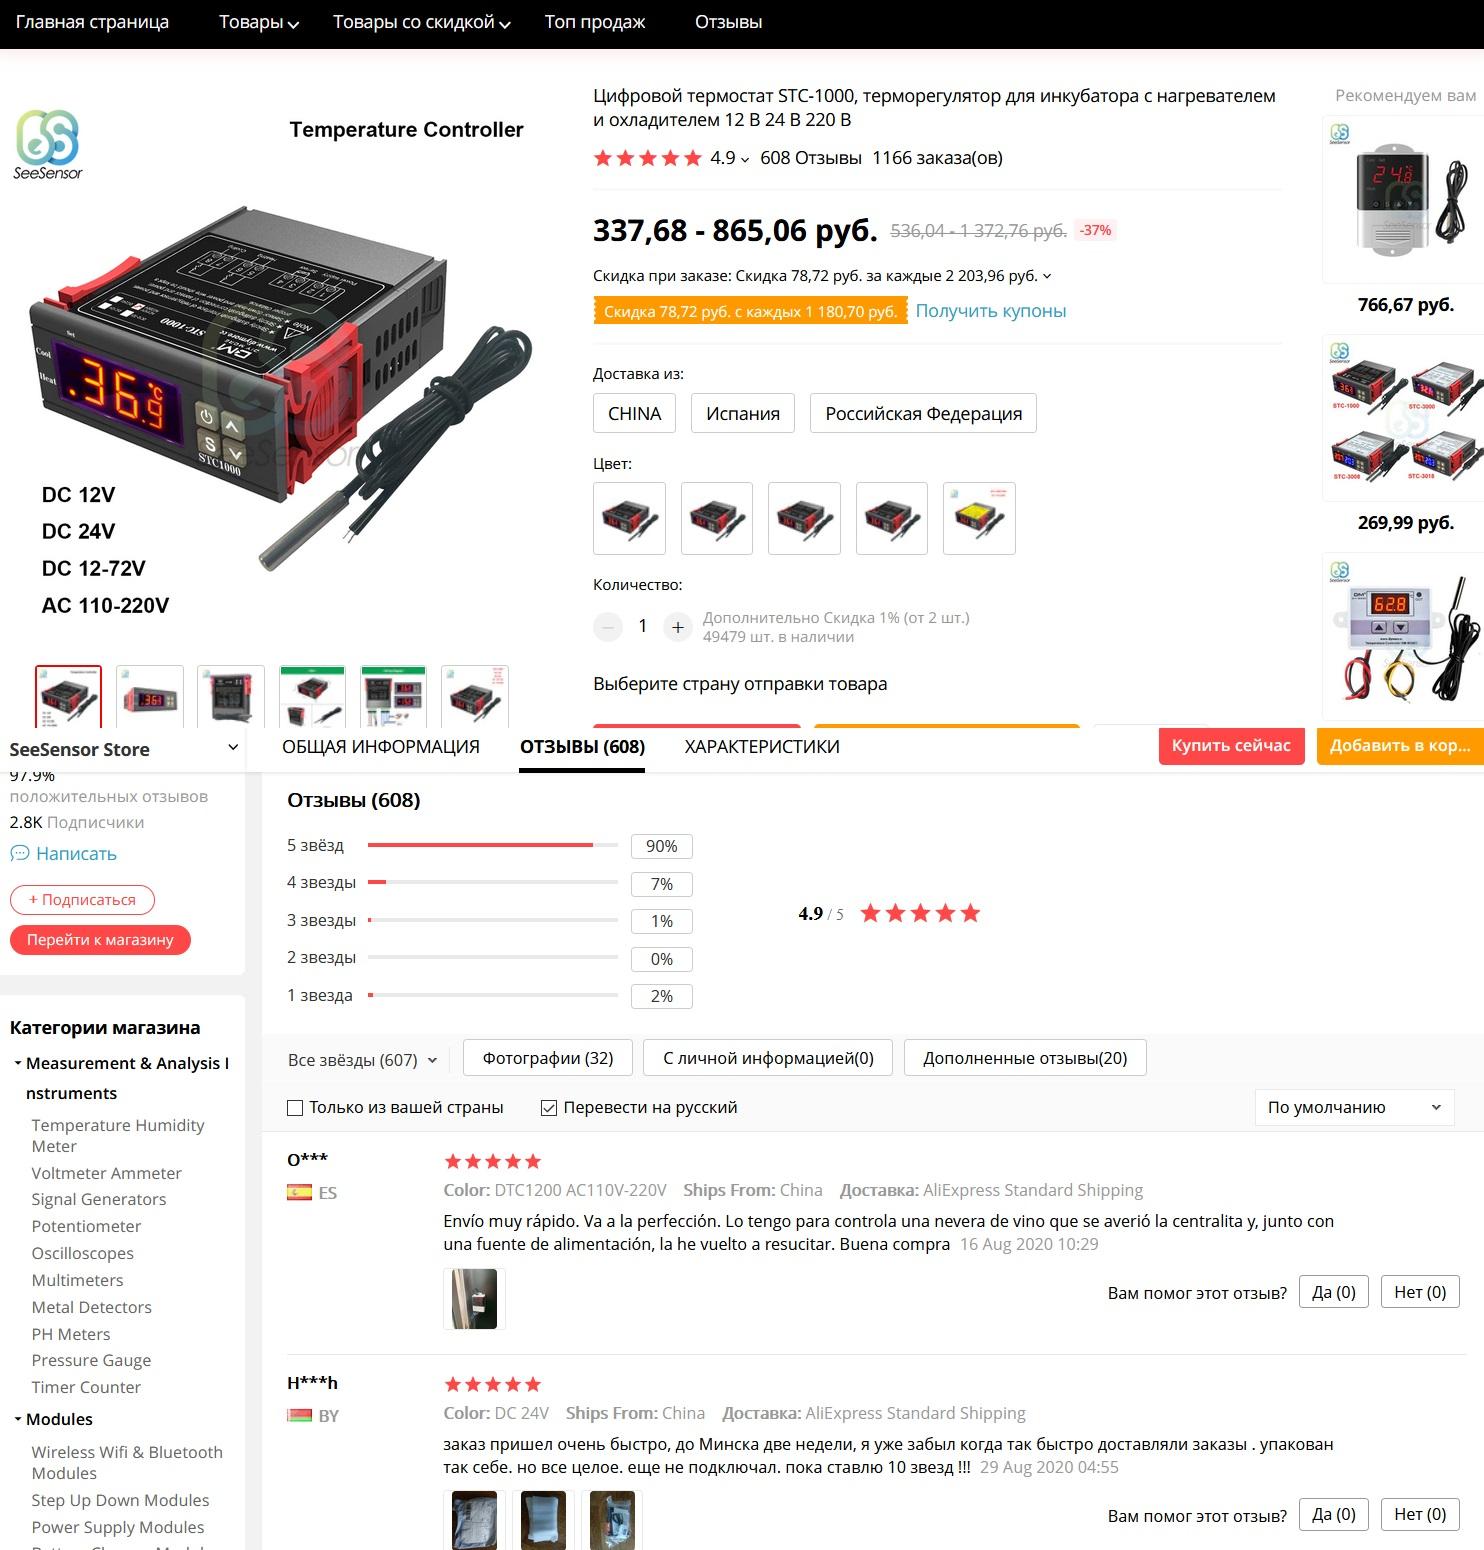 Терморегулятор Aideepen STC-1000